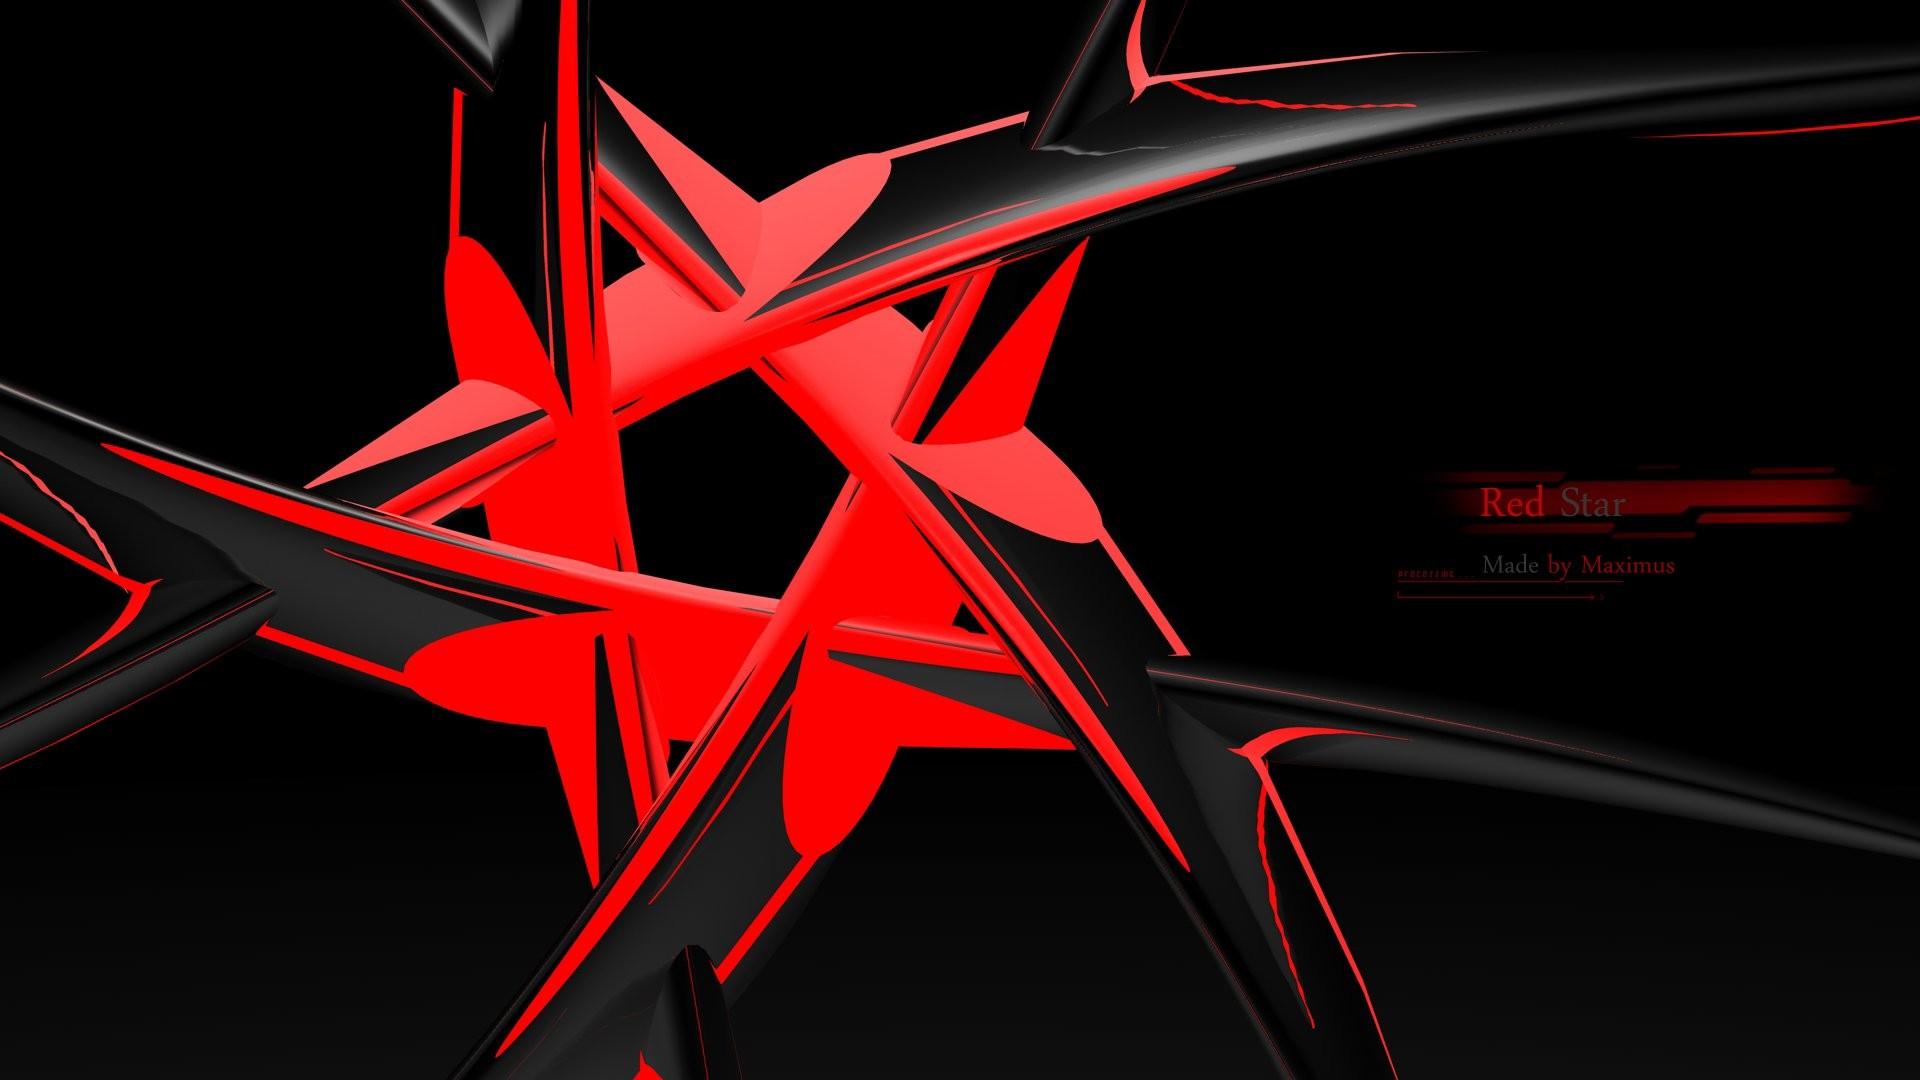 Red Star 840098